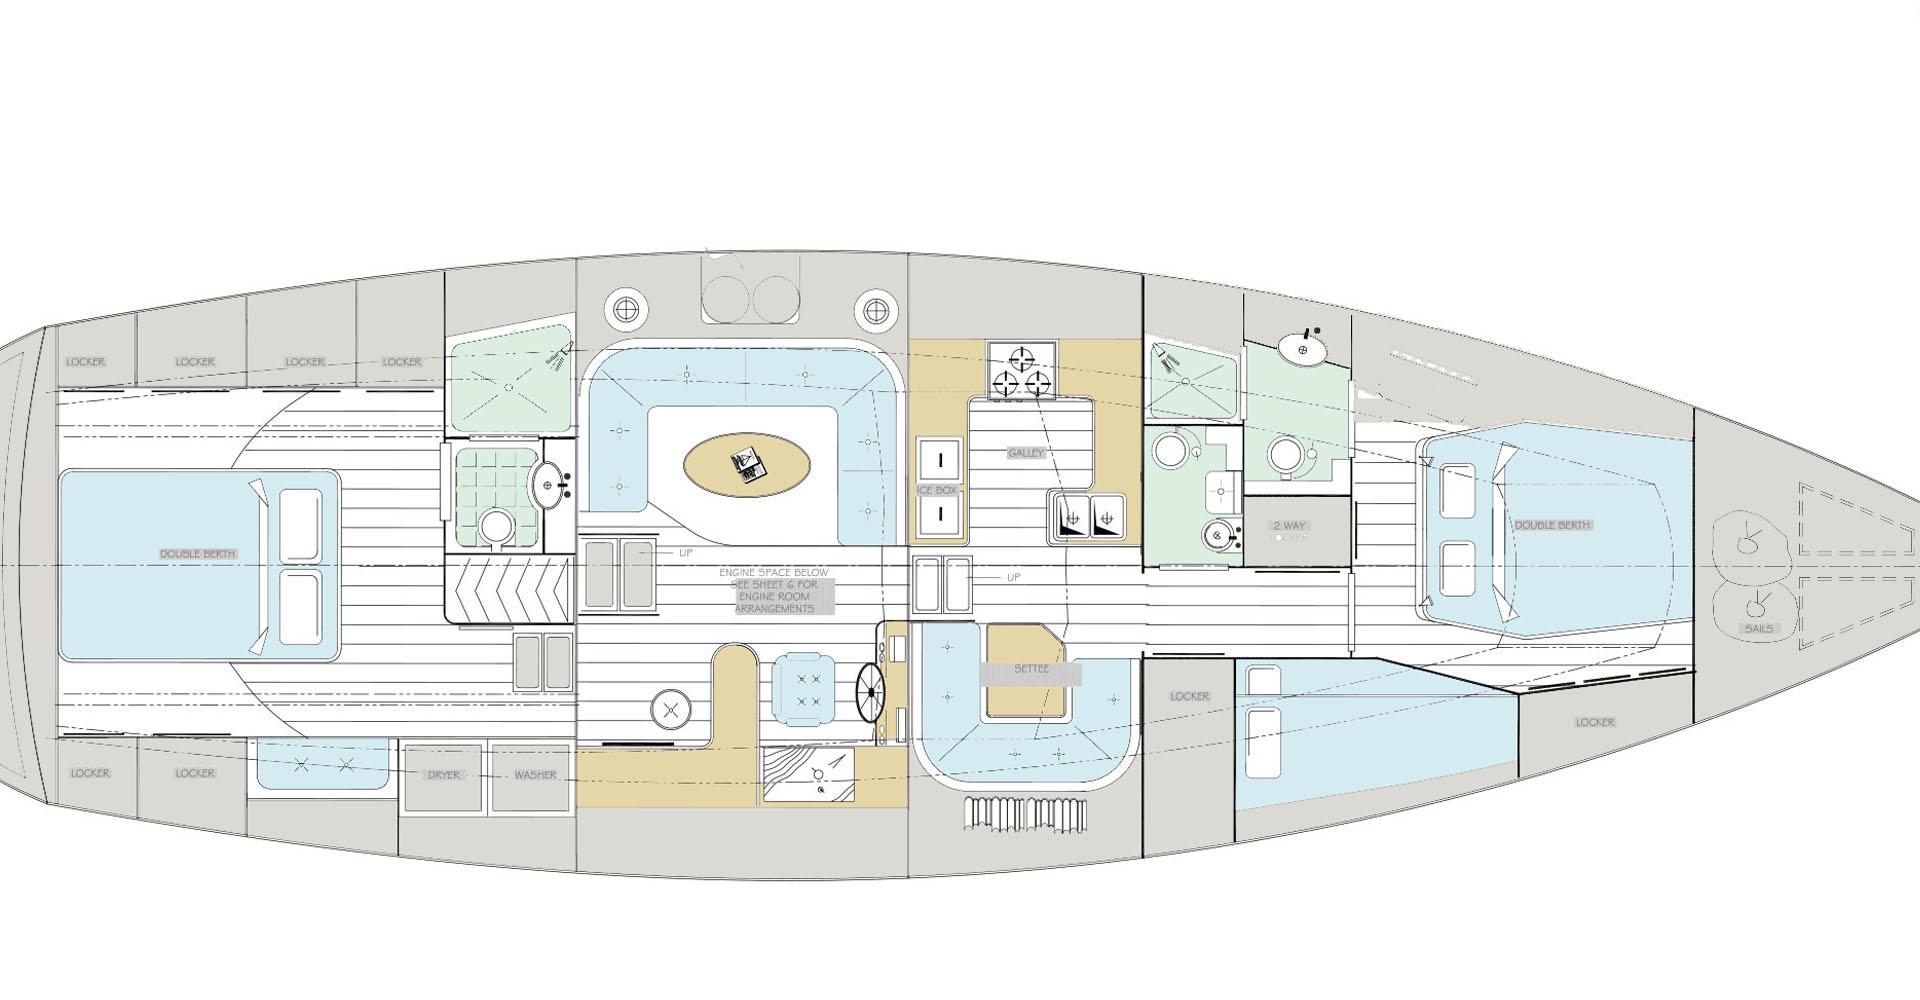 Narwhal Deck Plan